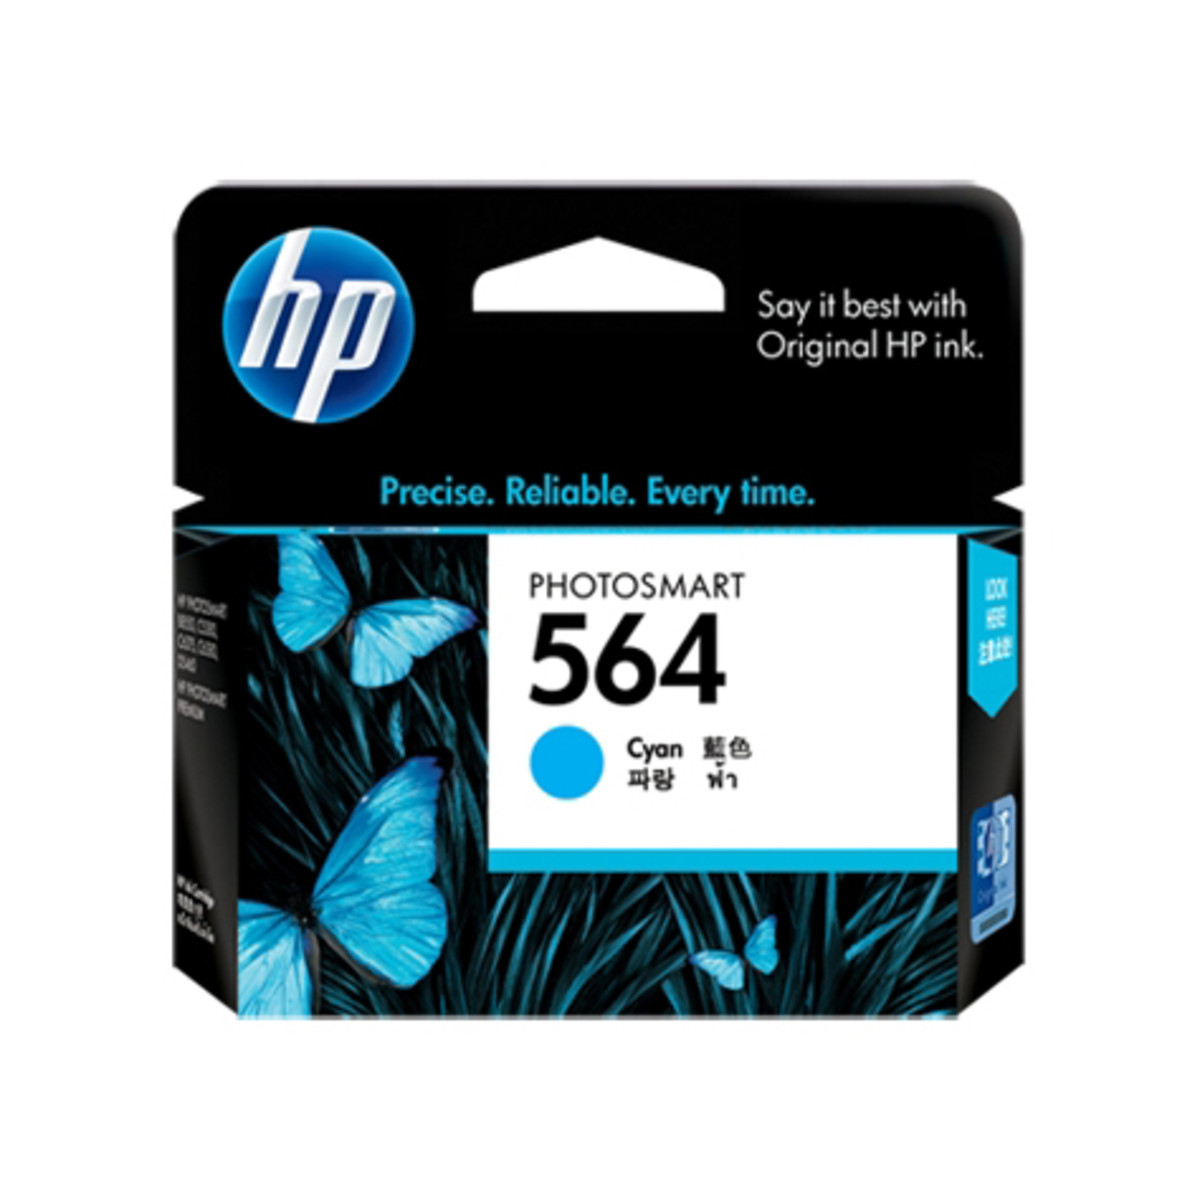 HP 564 (CB318WA) Cyan Ink Cartridge